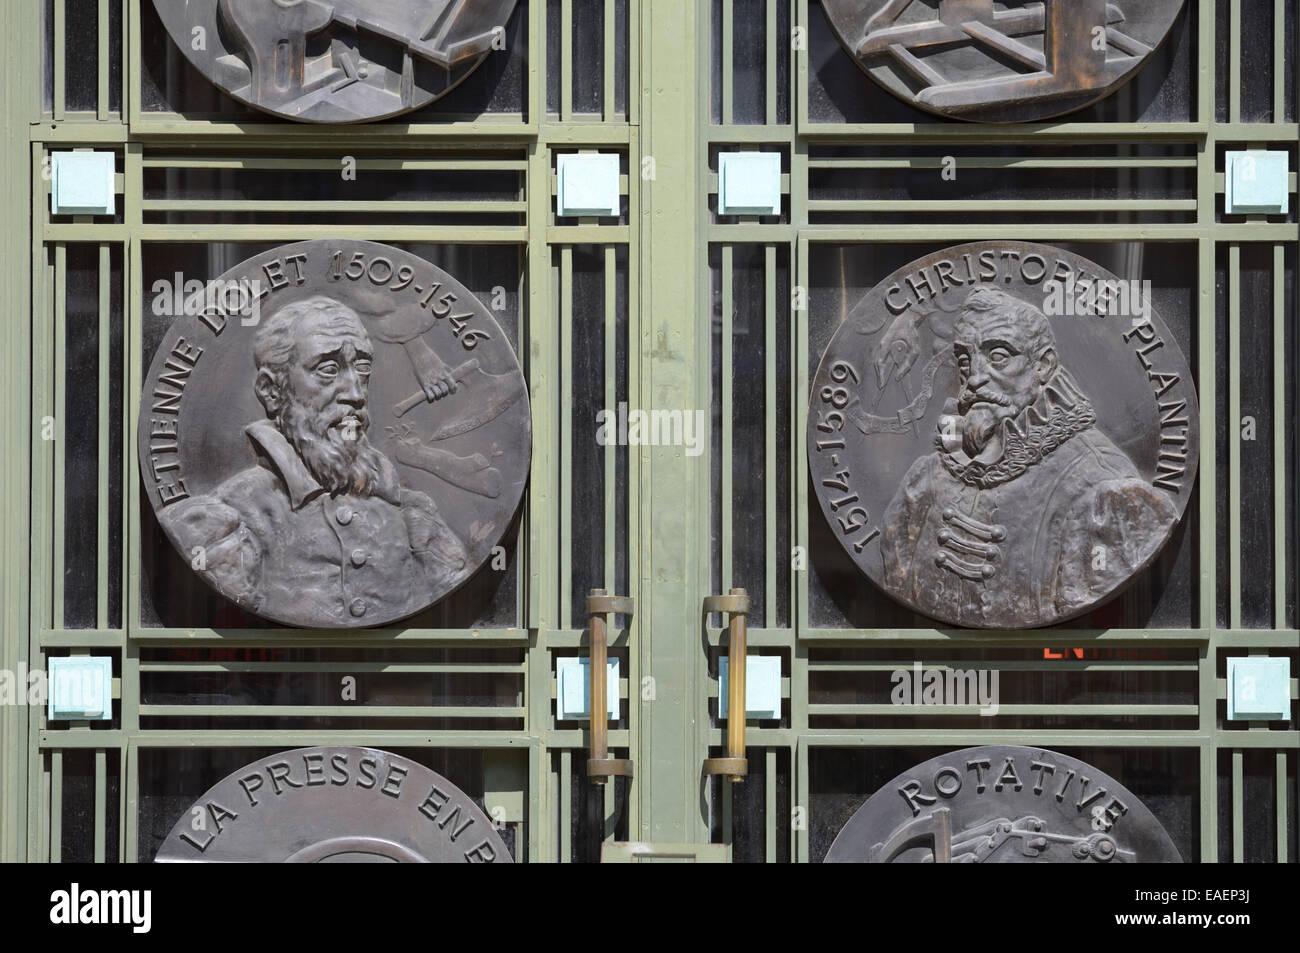 Retratos de impresoras francés Etienne Dolet (1509-1546) y Christophe Plantin (C1520-1589) 30s Art Decó de chapa Foto de stock